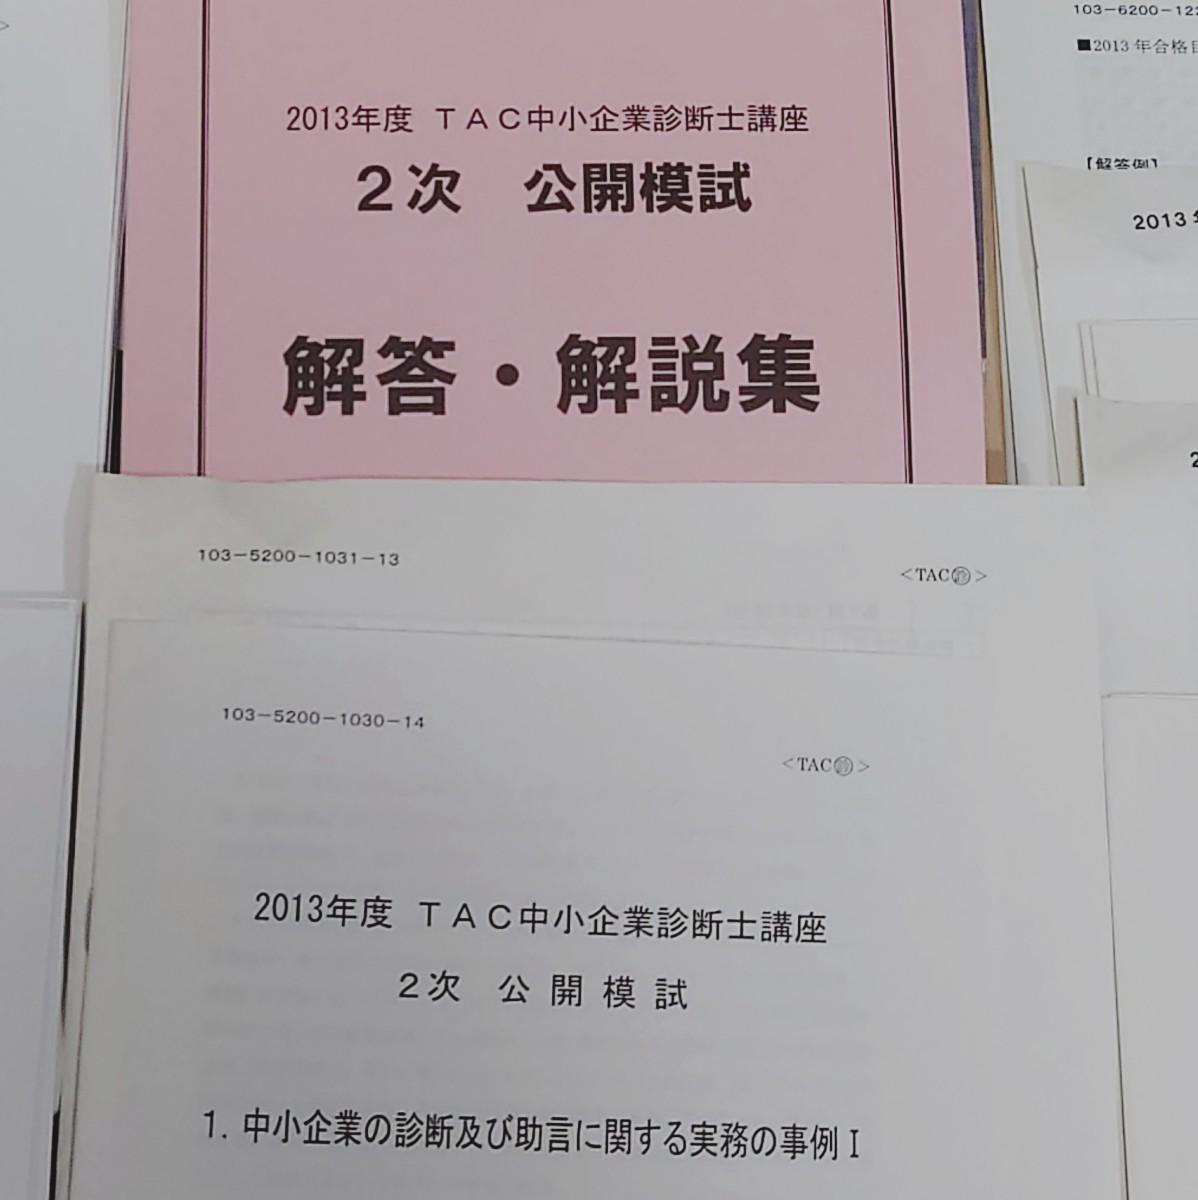 TAC 2013年度 2次試験対策 直前演習 公開模試 過去問題集 中小企業診断士